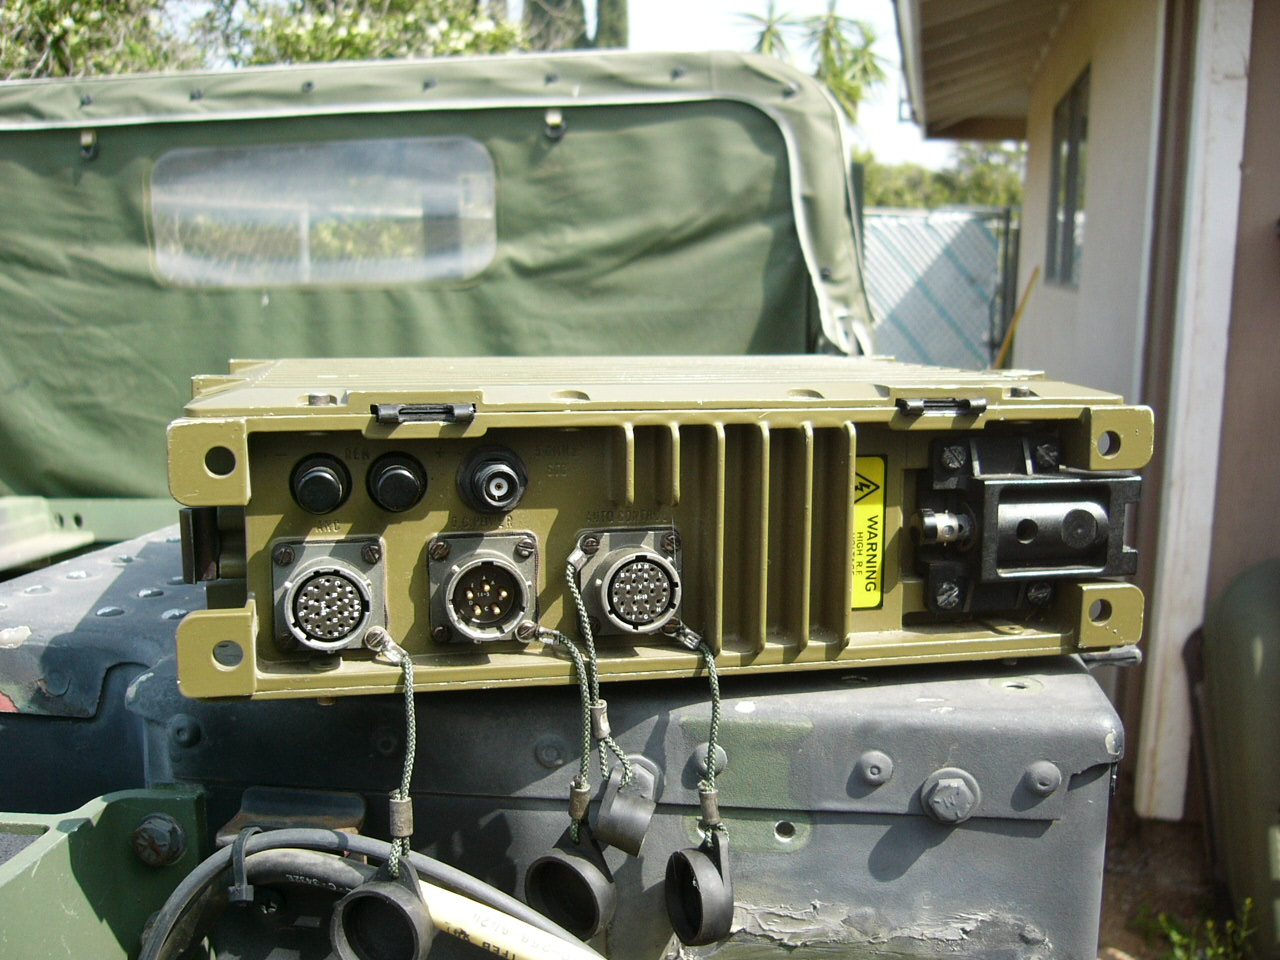 Plessey 4300 HF Manpack Radio – Mark's Tech Journal